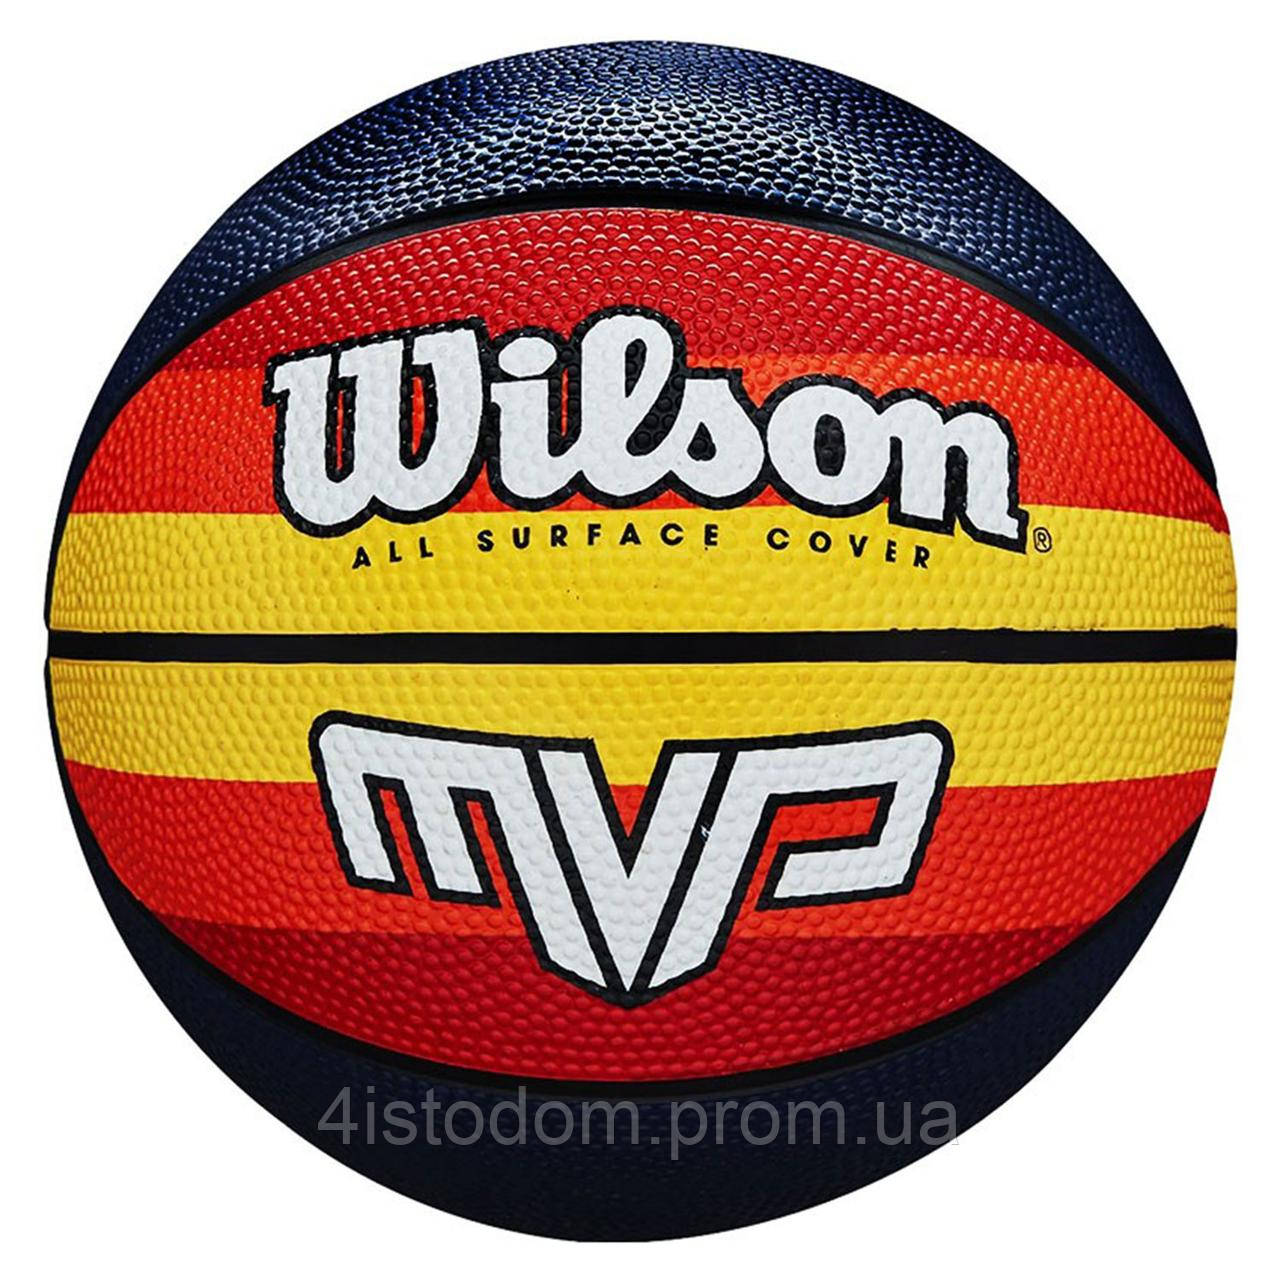 Мяч баскетбольный Wilson MVP retro or/ye size7